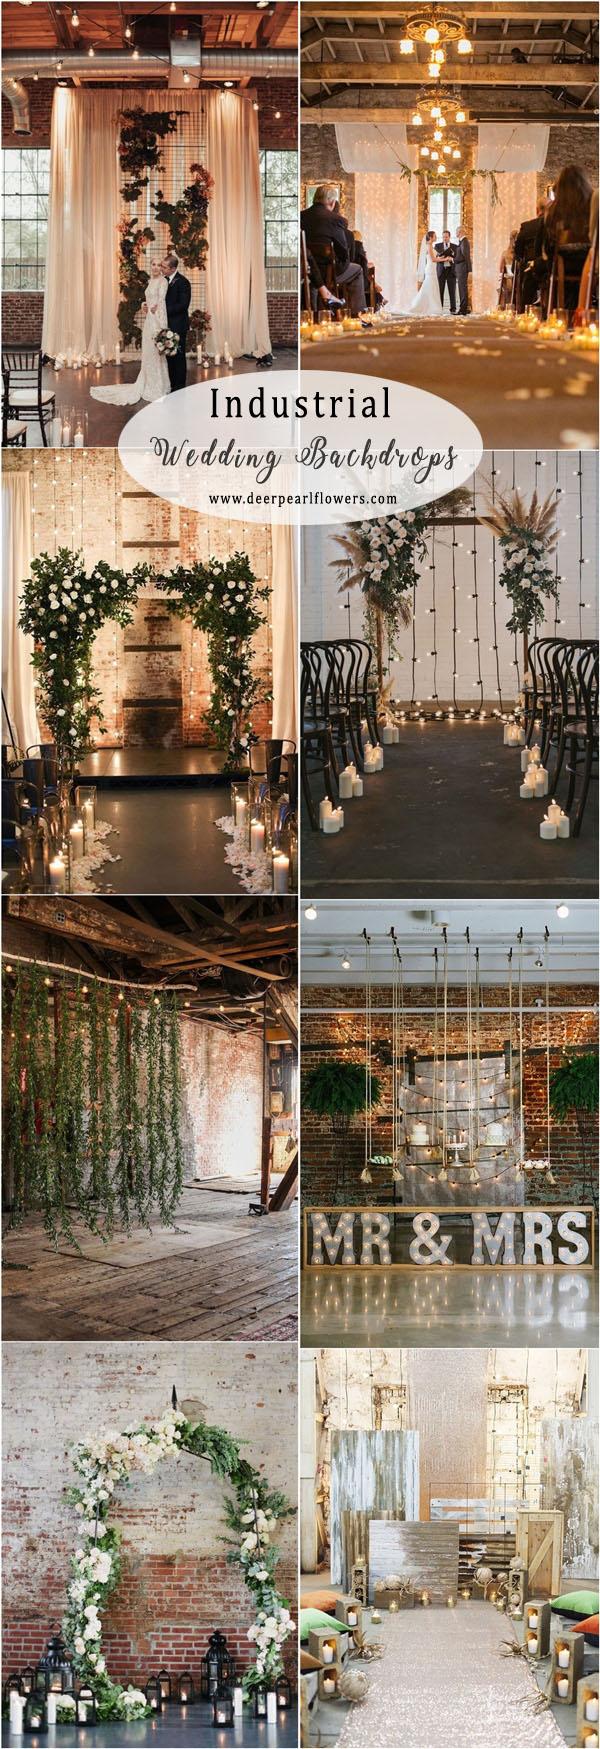 Wedding Backdrop Ideas 20 Industrial Loft Style Wedding Ceremony Backdrop Ideas Deer